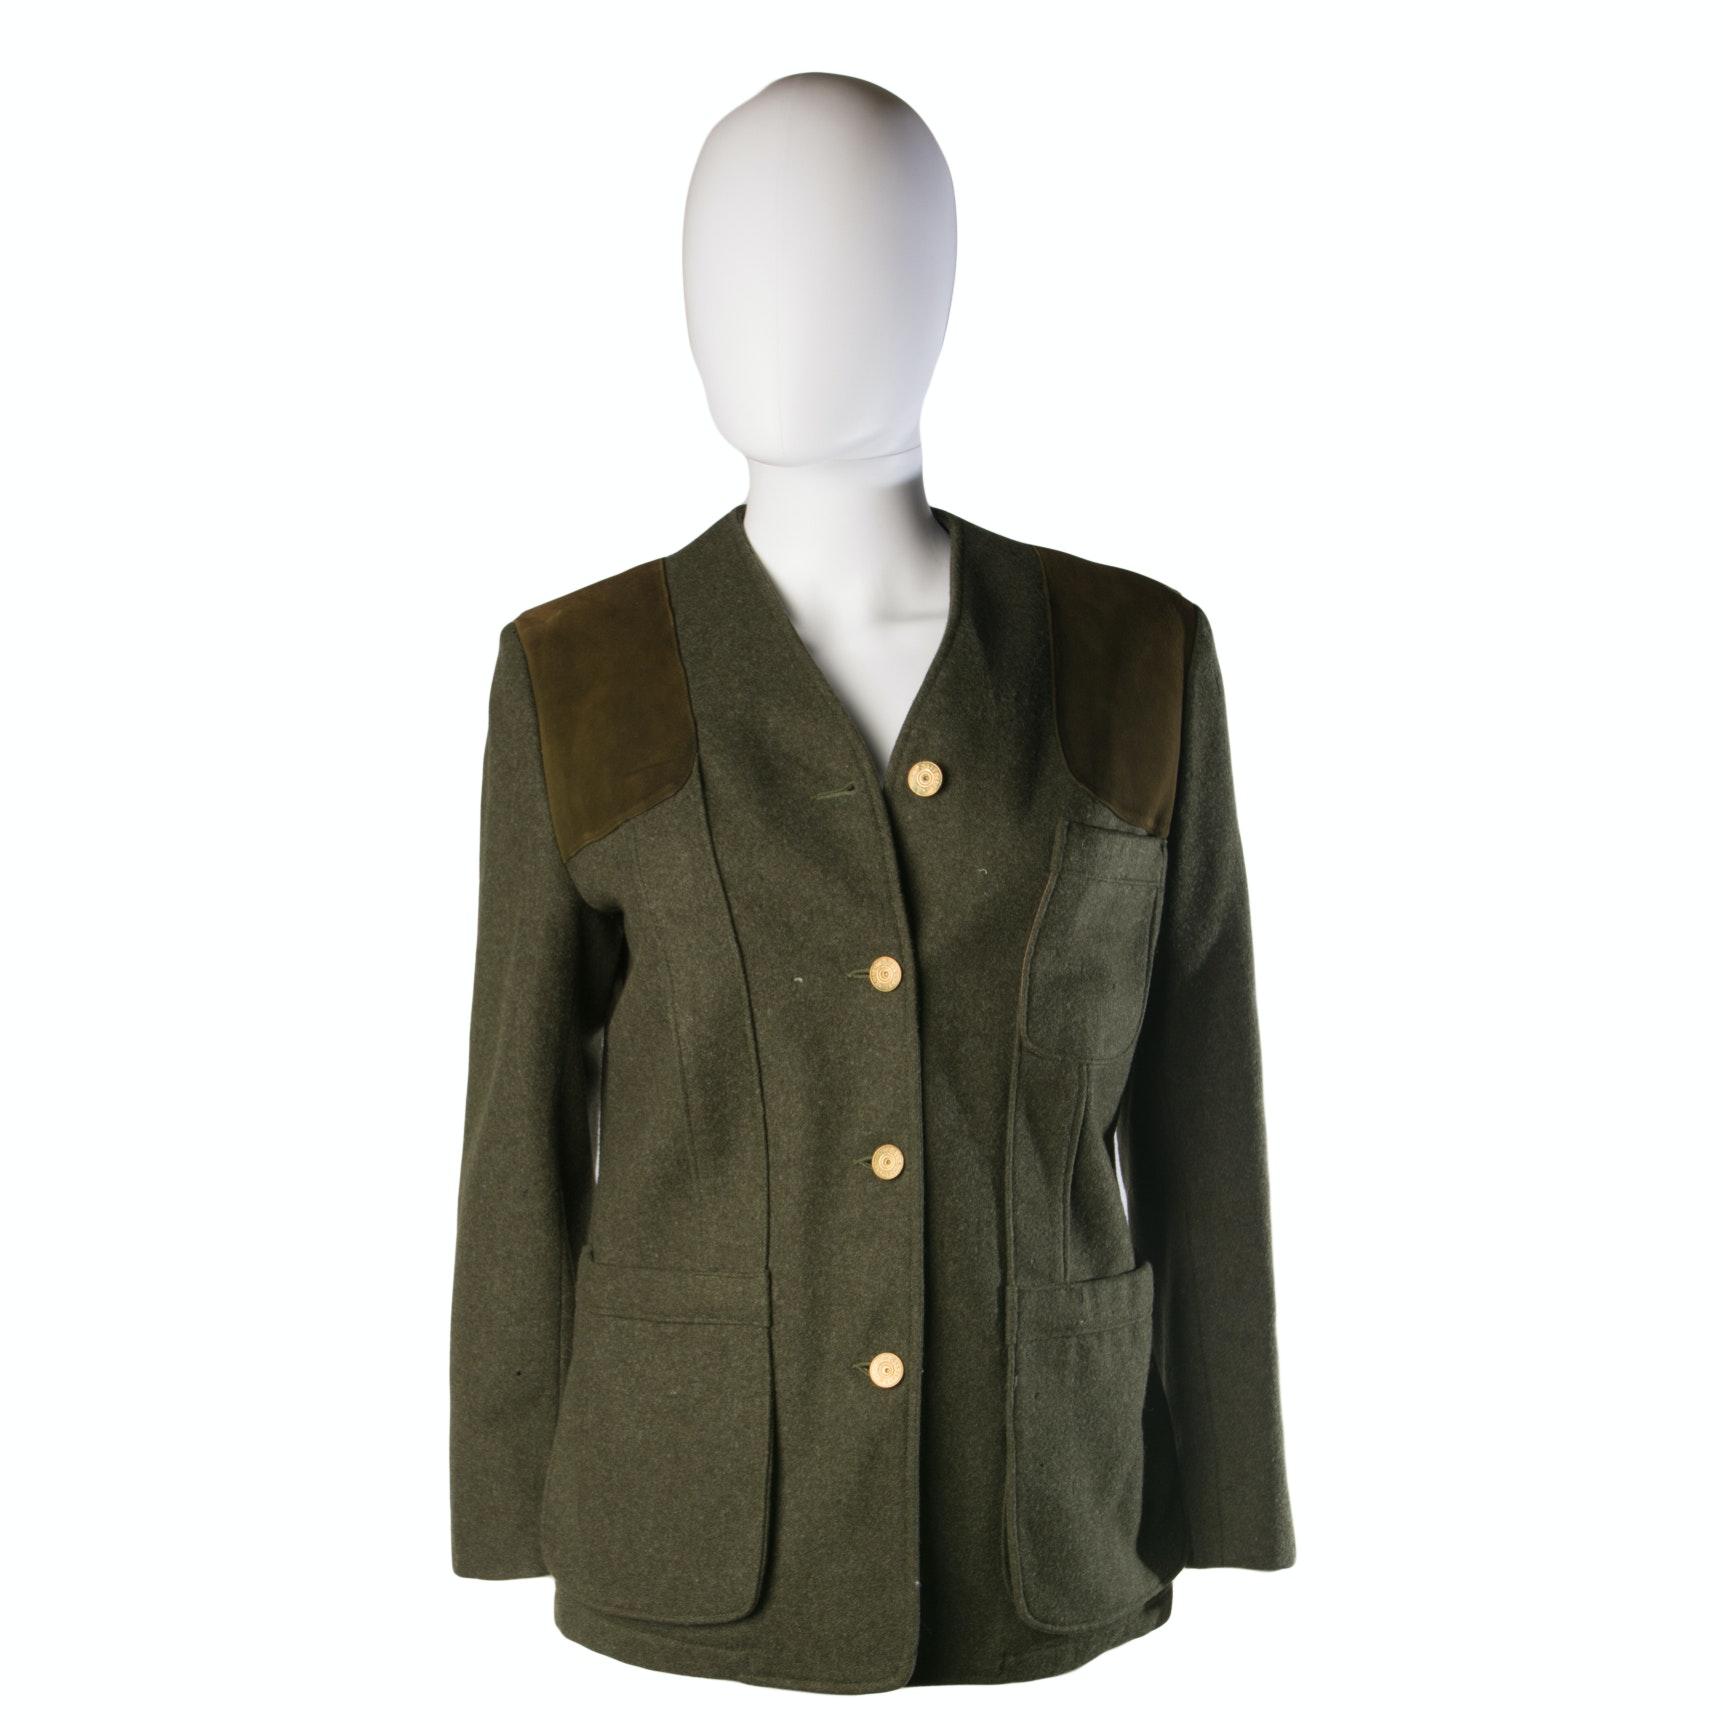 Vintage Abercrombie & Fitch Riding Jacket